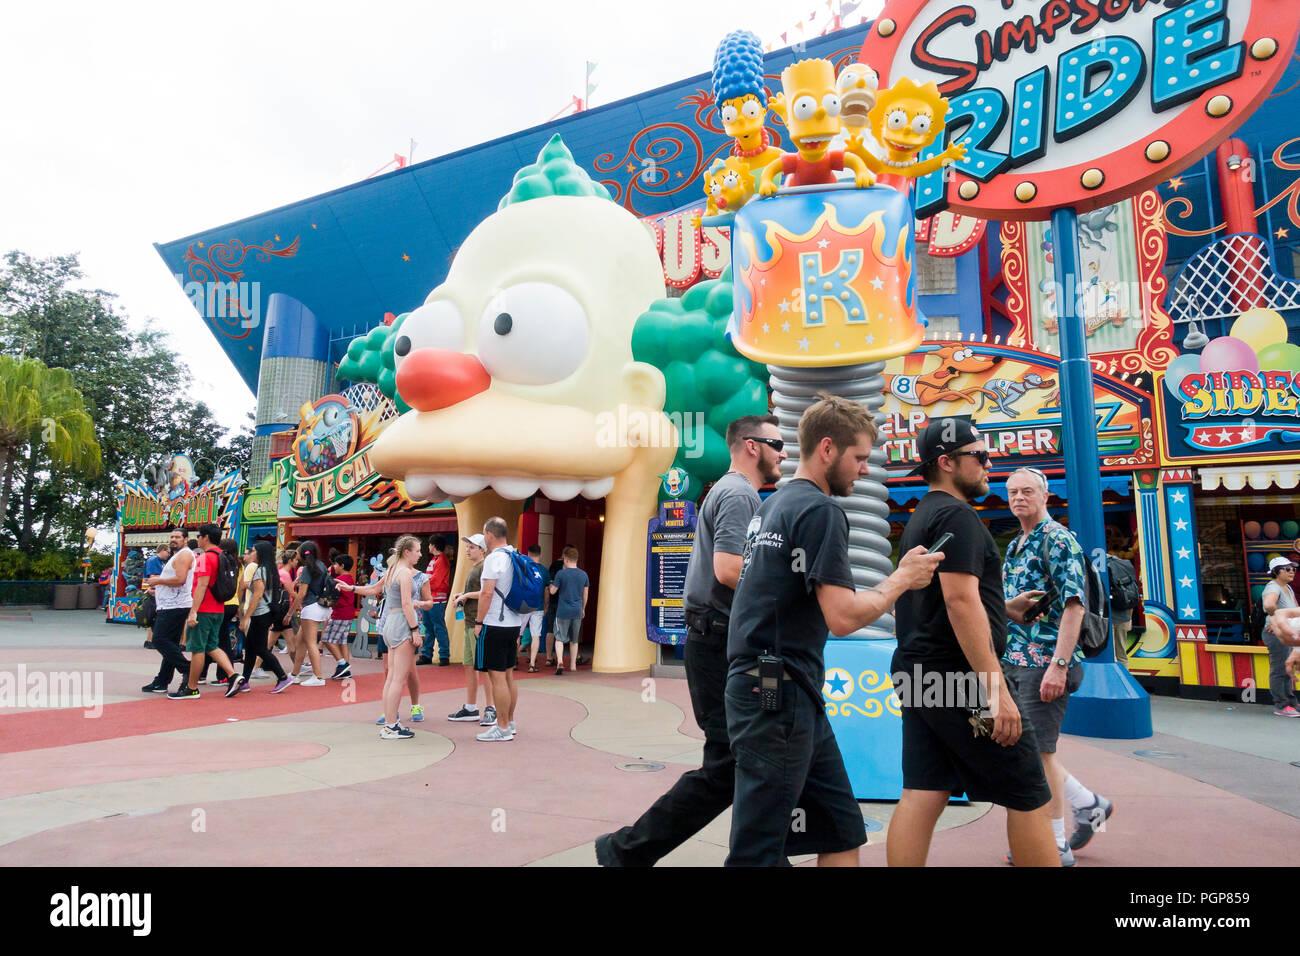 The Simpsons Ride at Springfield USA, Universal Studios Florida - Orlando, Florida USA - Stock Image